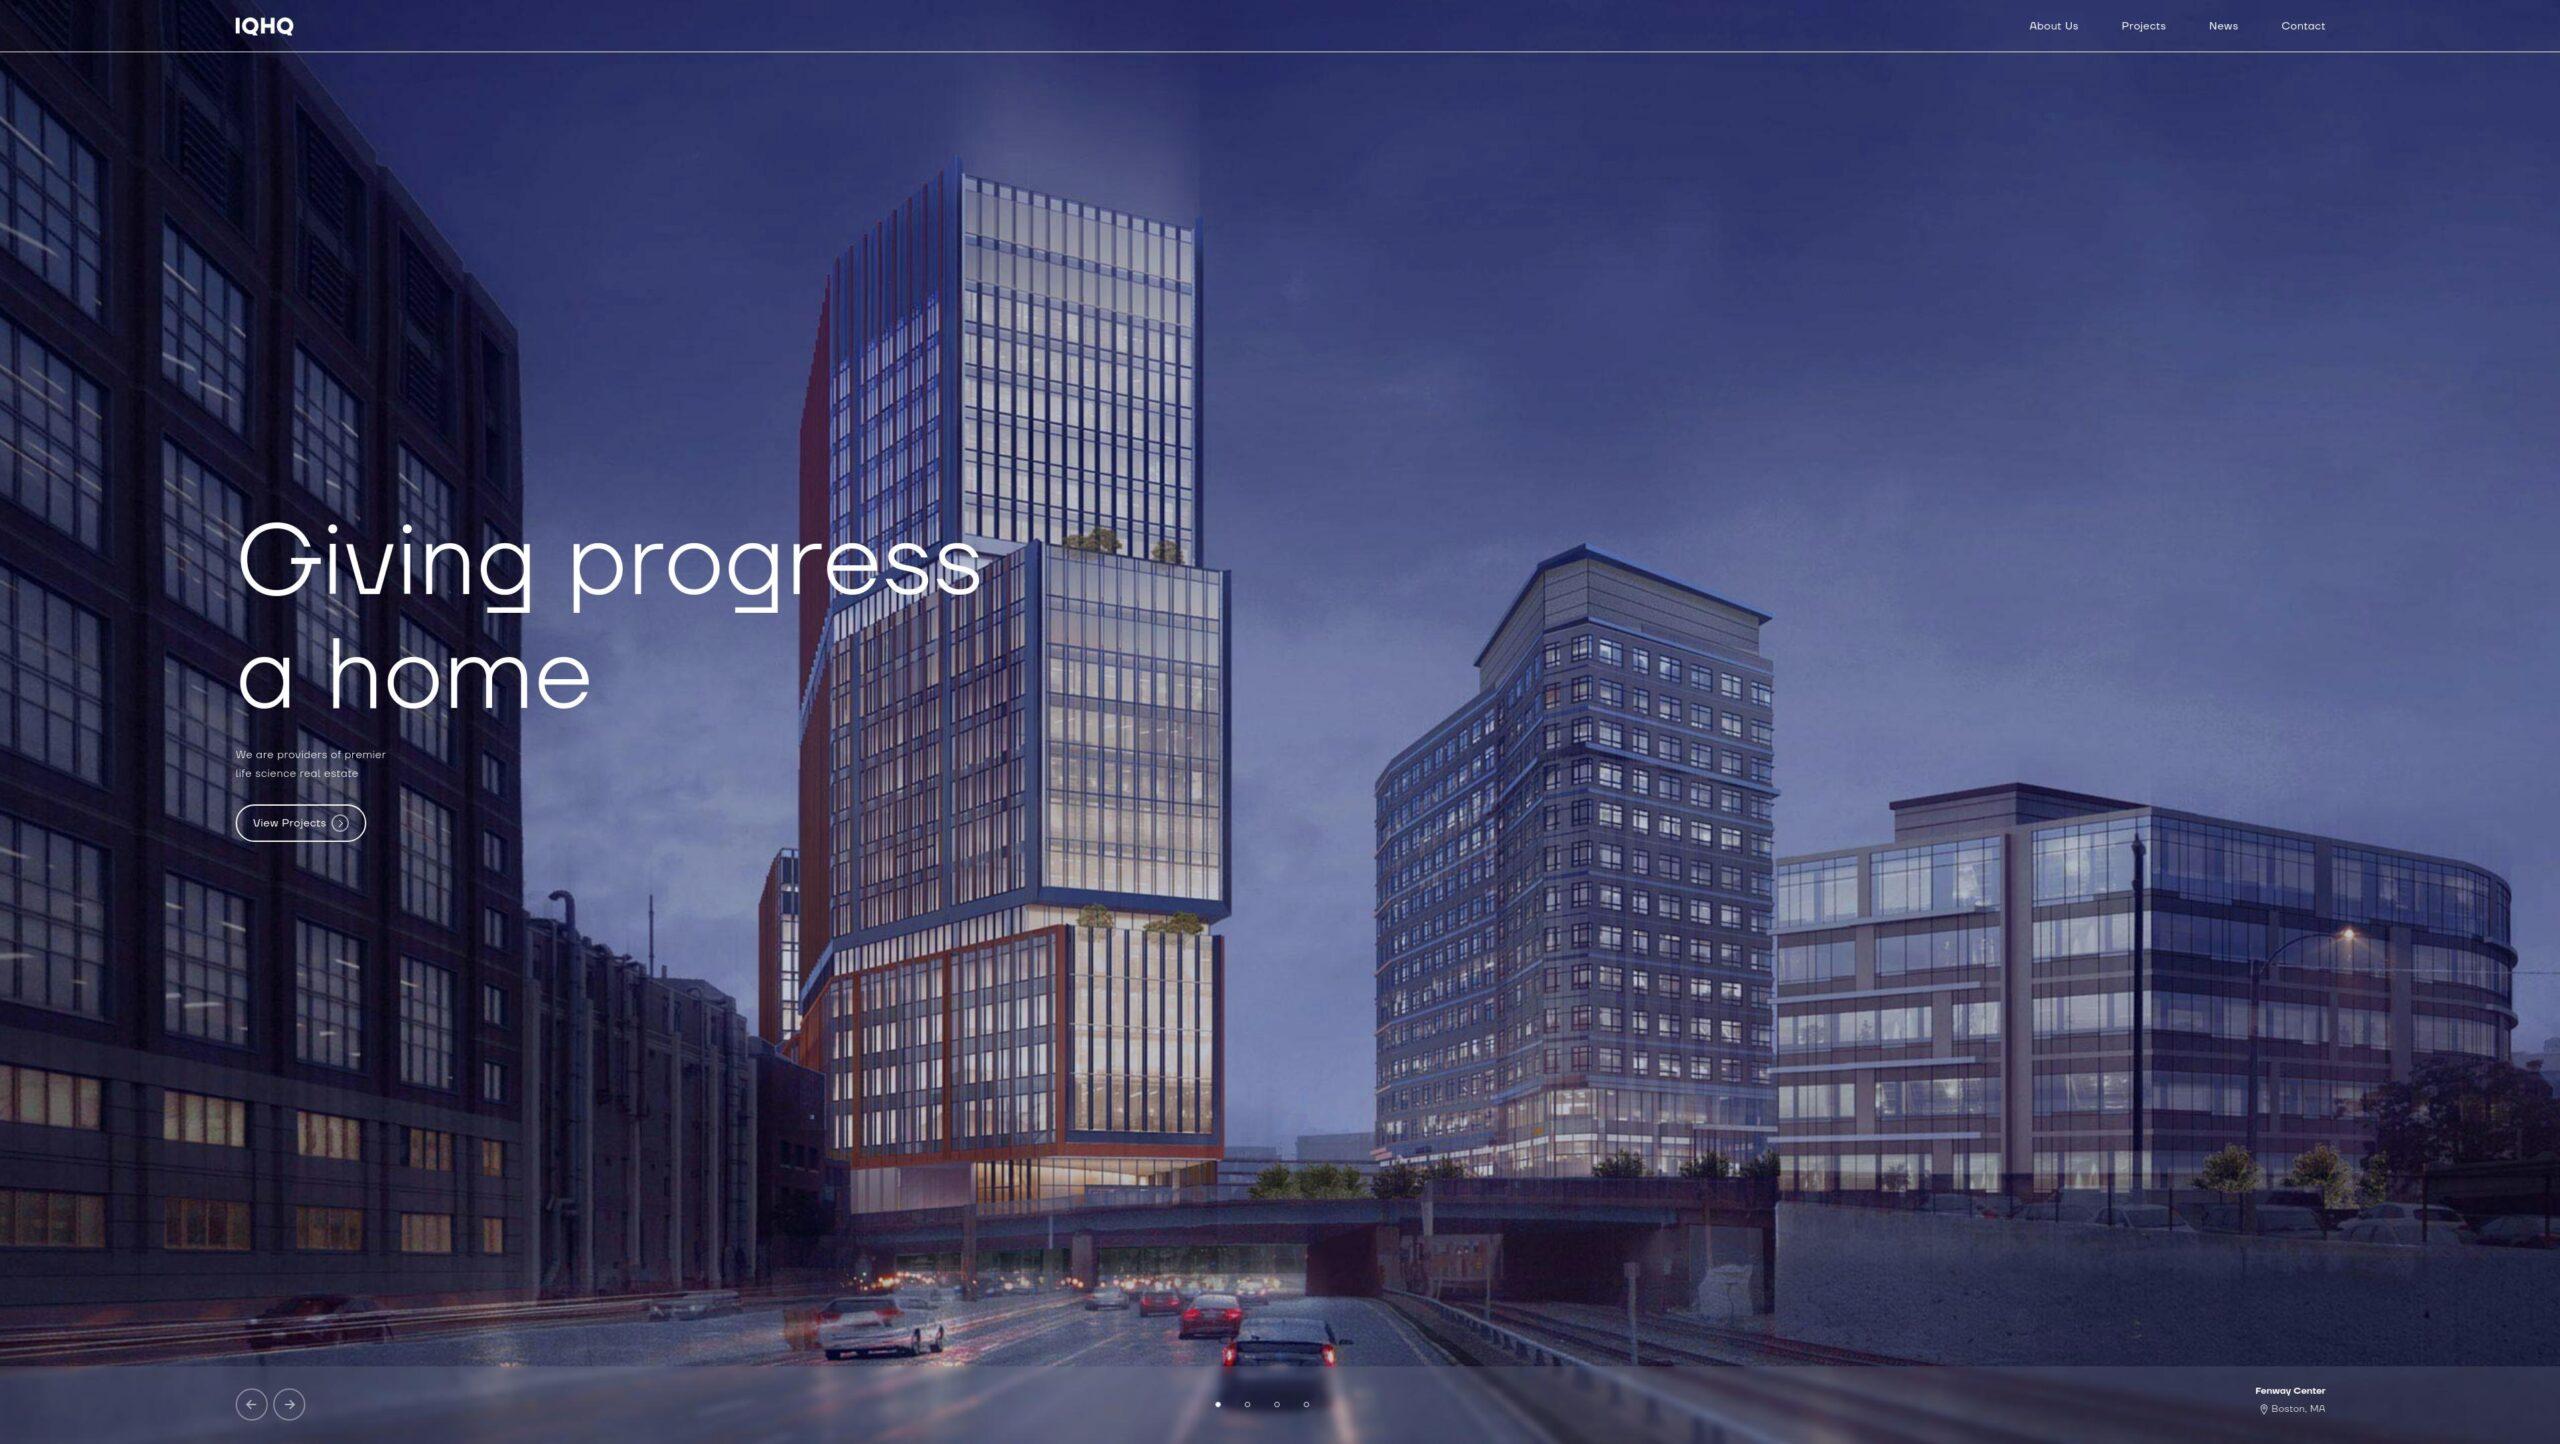 Orpetron Web Design Awards - IQHQ Real Estate Investment - Web Design Awards Inspiration Trends UI UX